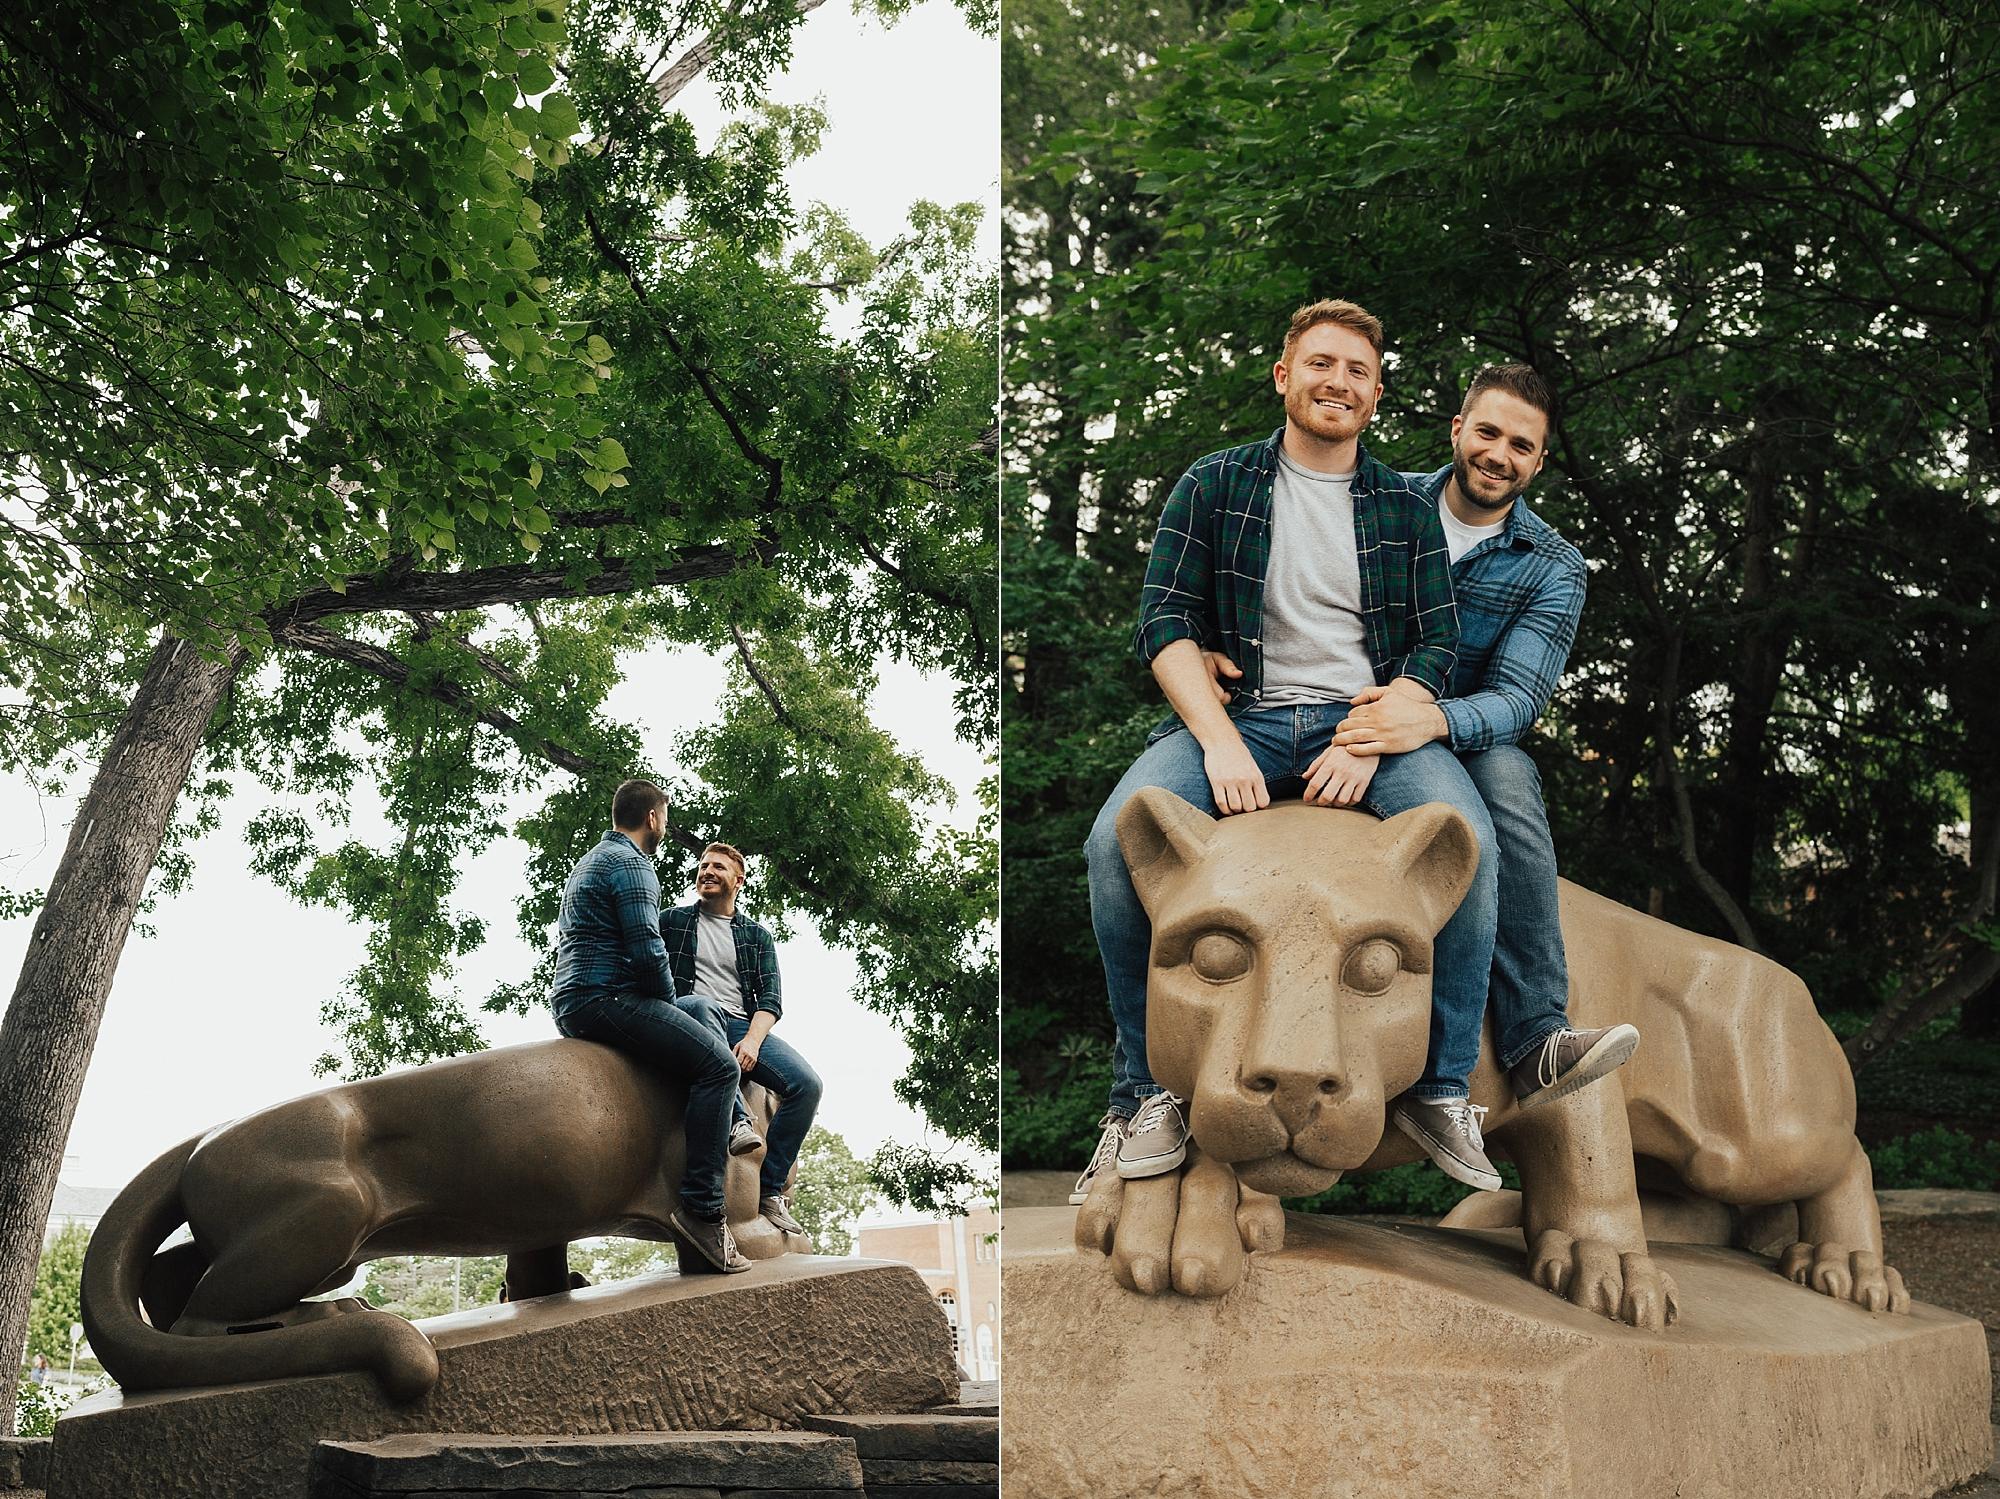 Joe_Mac_Creative_Wedding_Engagement_Philadelphia_Philly_Photography_LGBT_Gay_Penn_State___0002.jpg